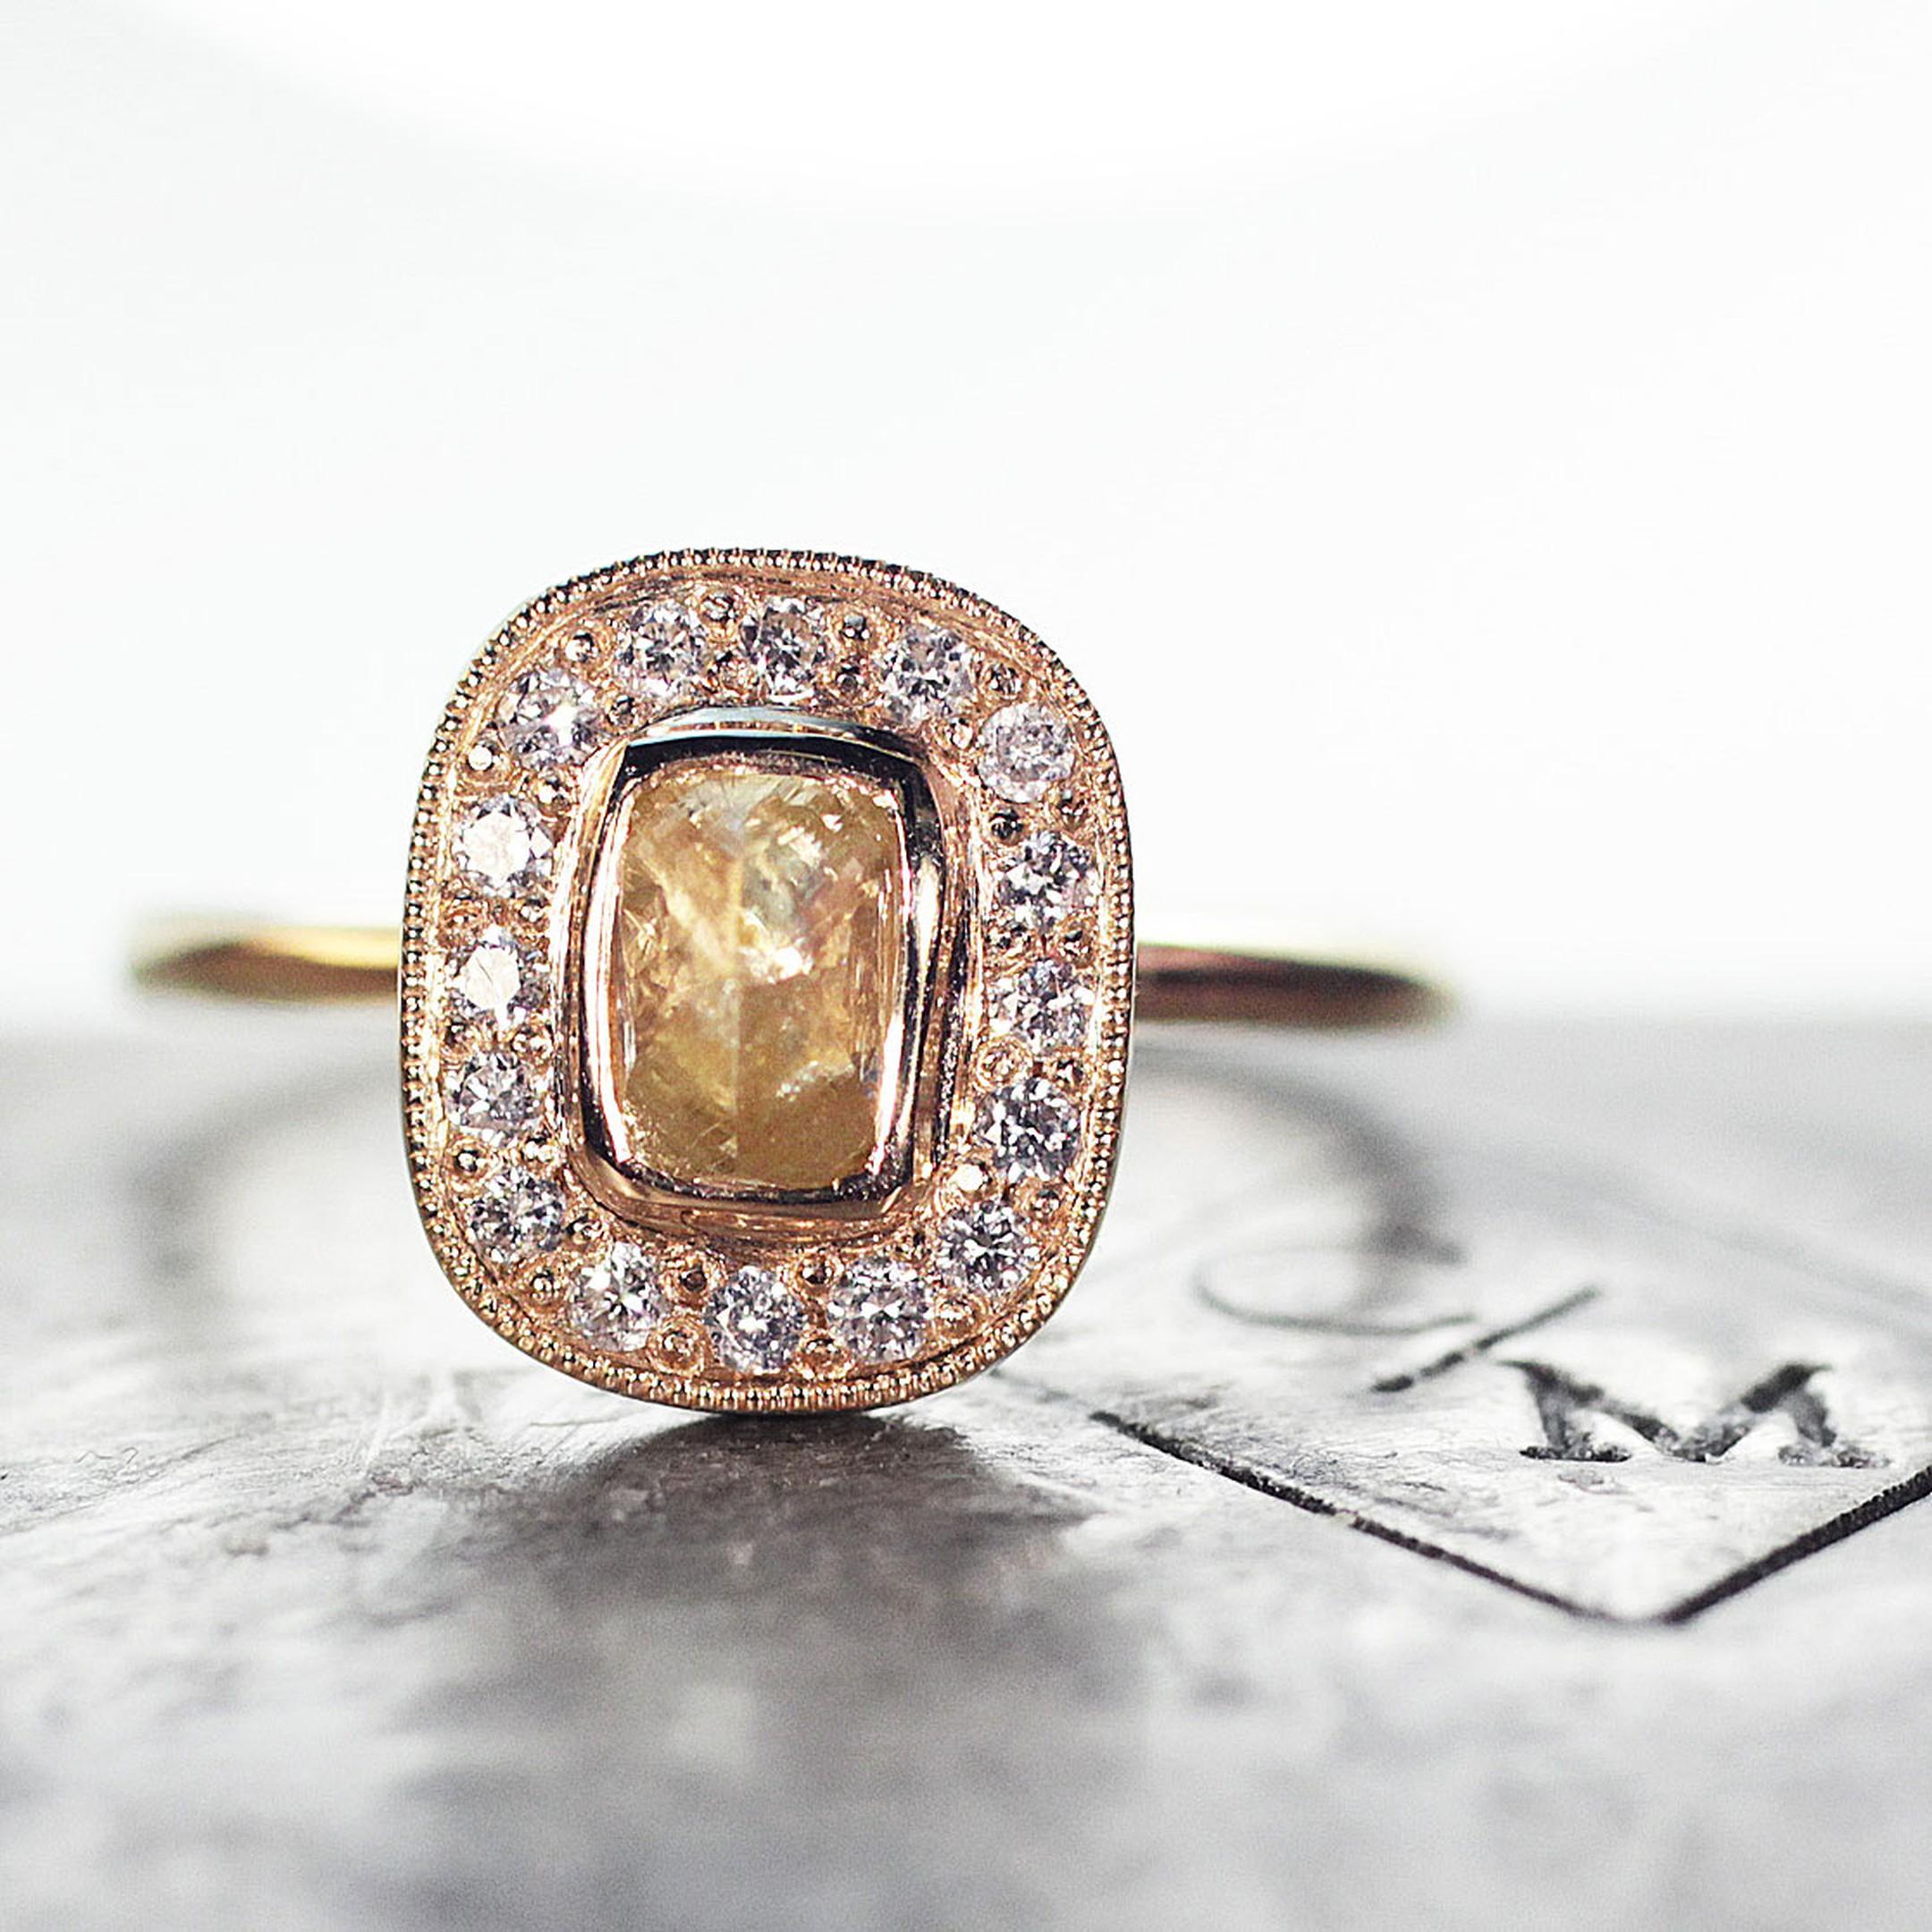 chinchar-maloney-uncut-internally-flawless-k-coloured-octahedron-diamond-ring.jpg-2160x0-q90-crop-scale-subsampling-2-upscale-false.jpg